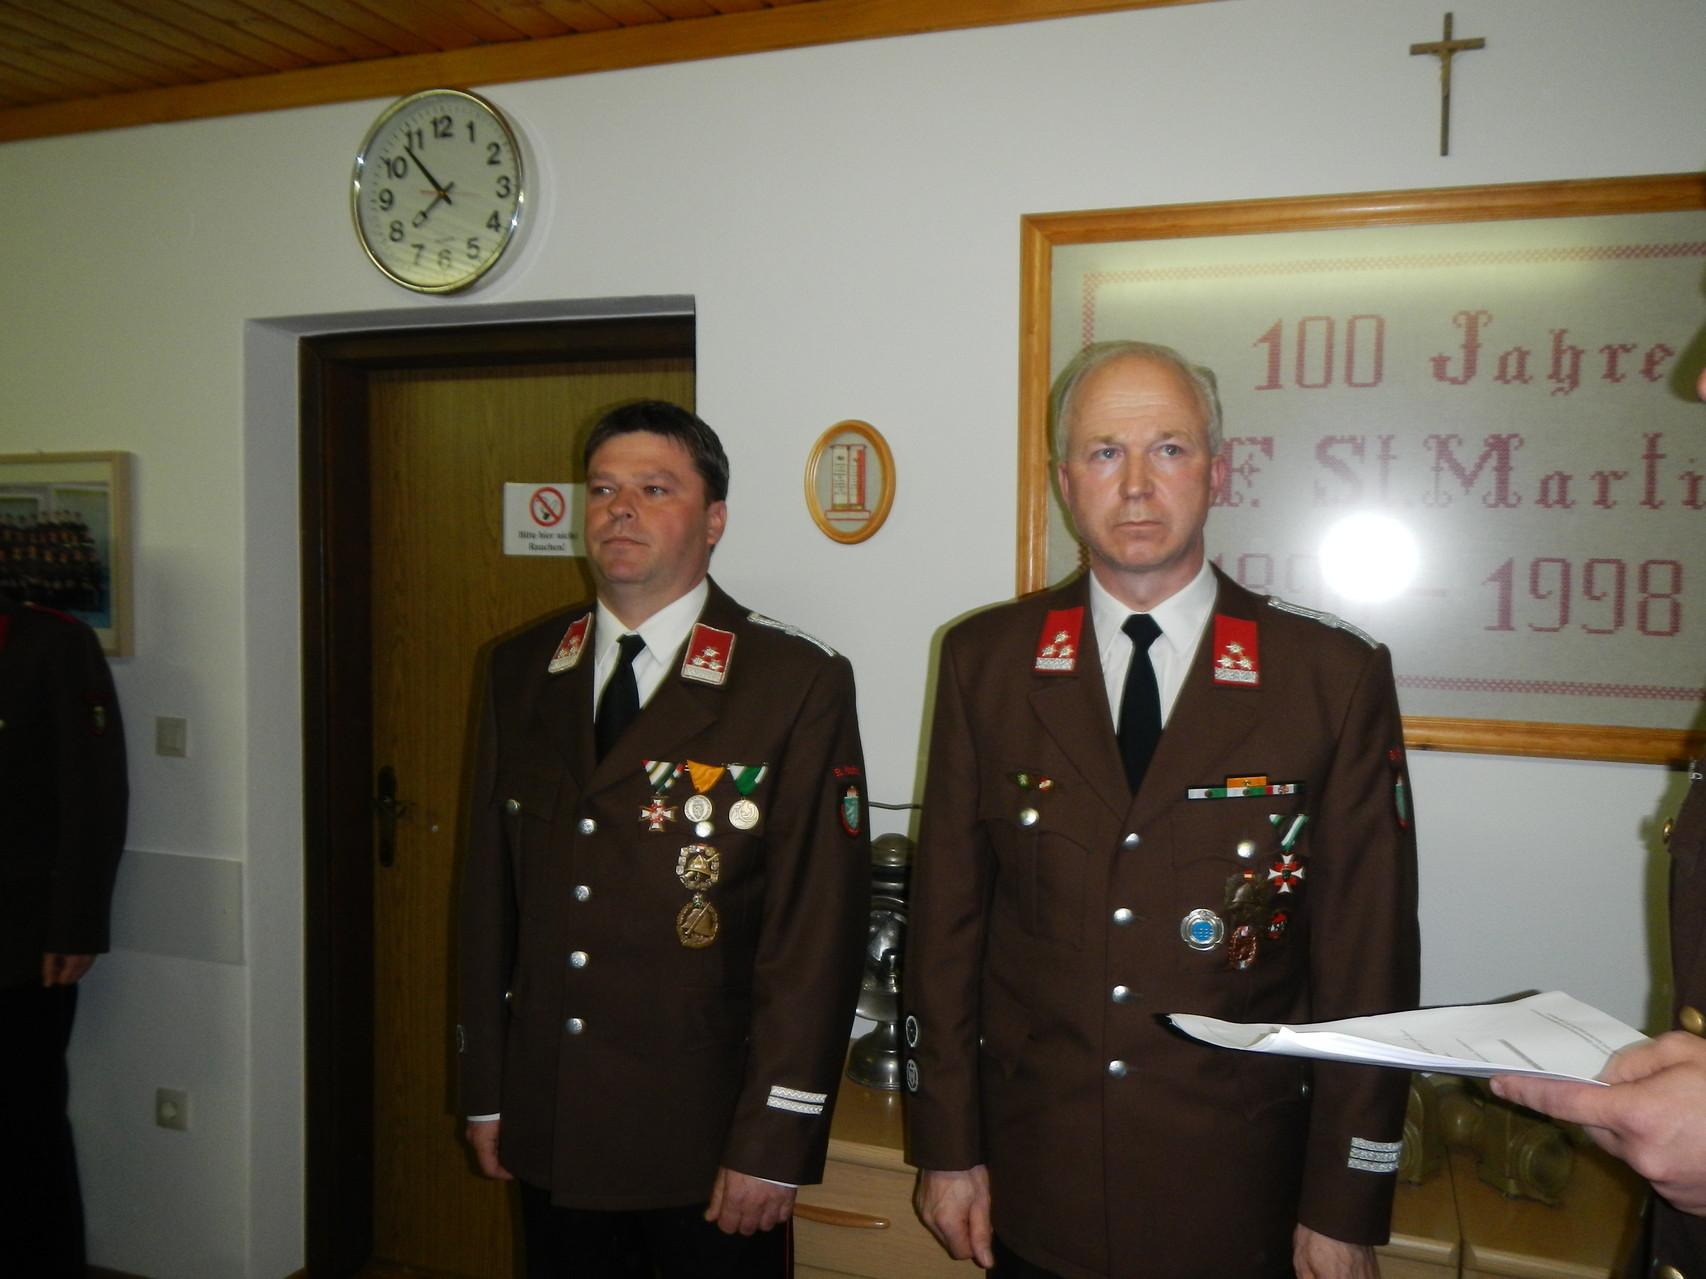 Beförderung zu Brandmeister